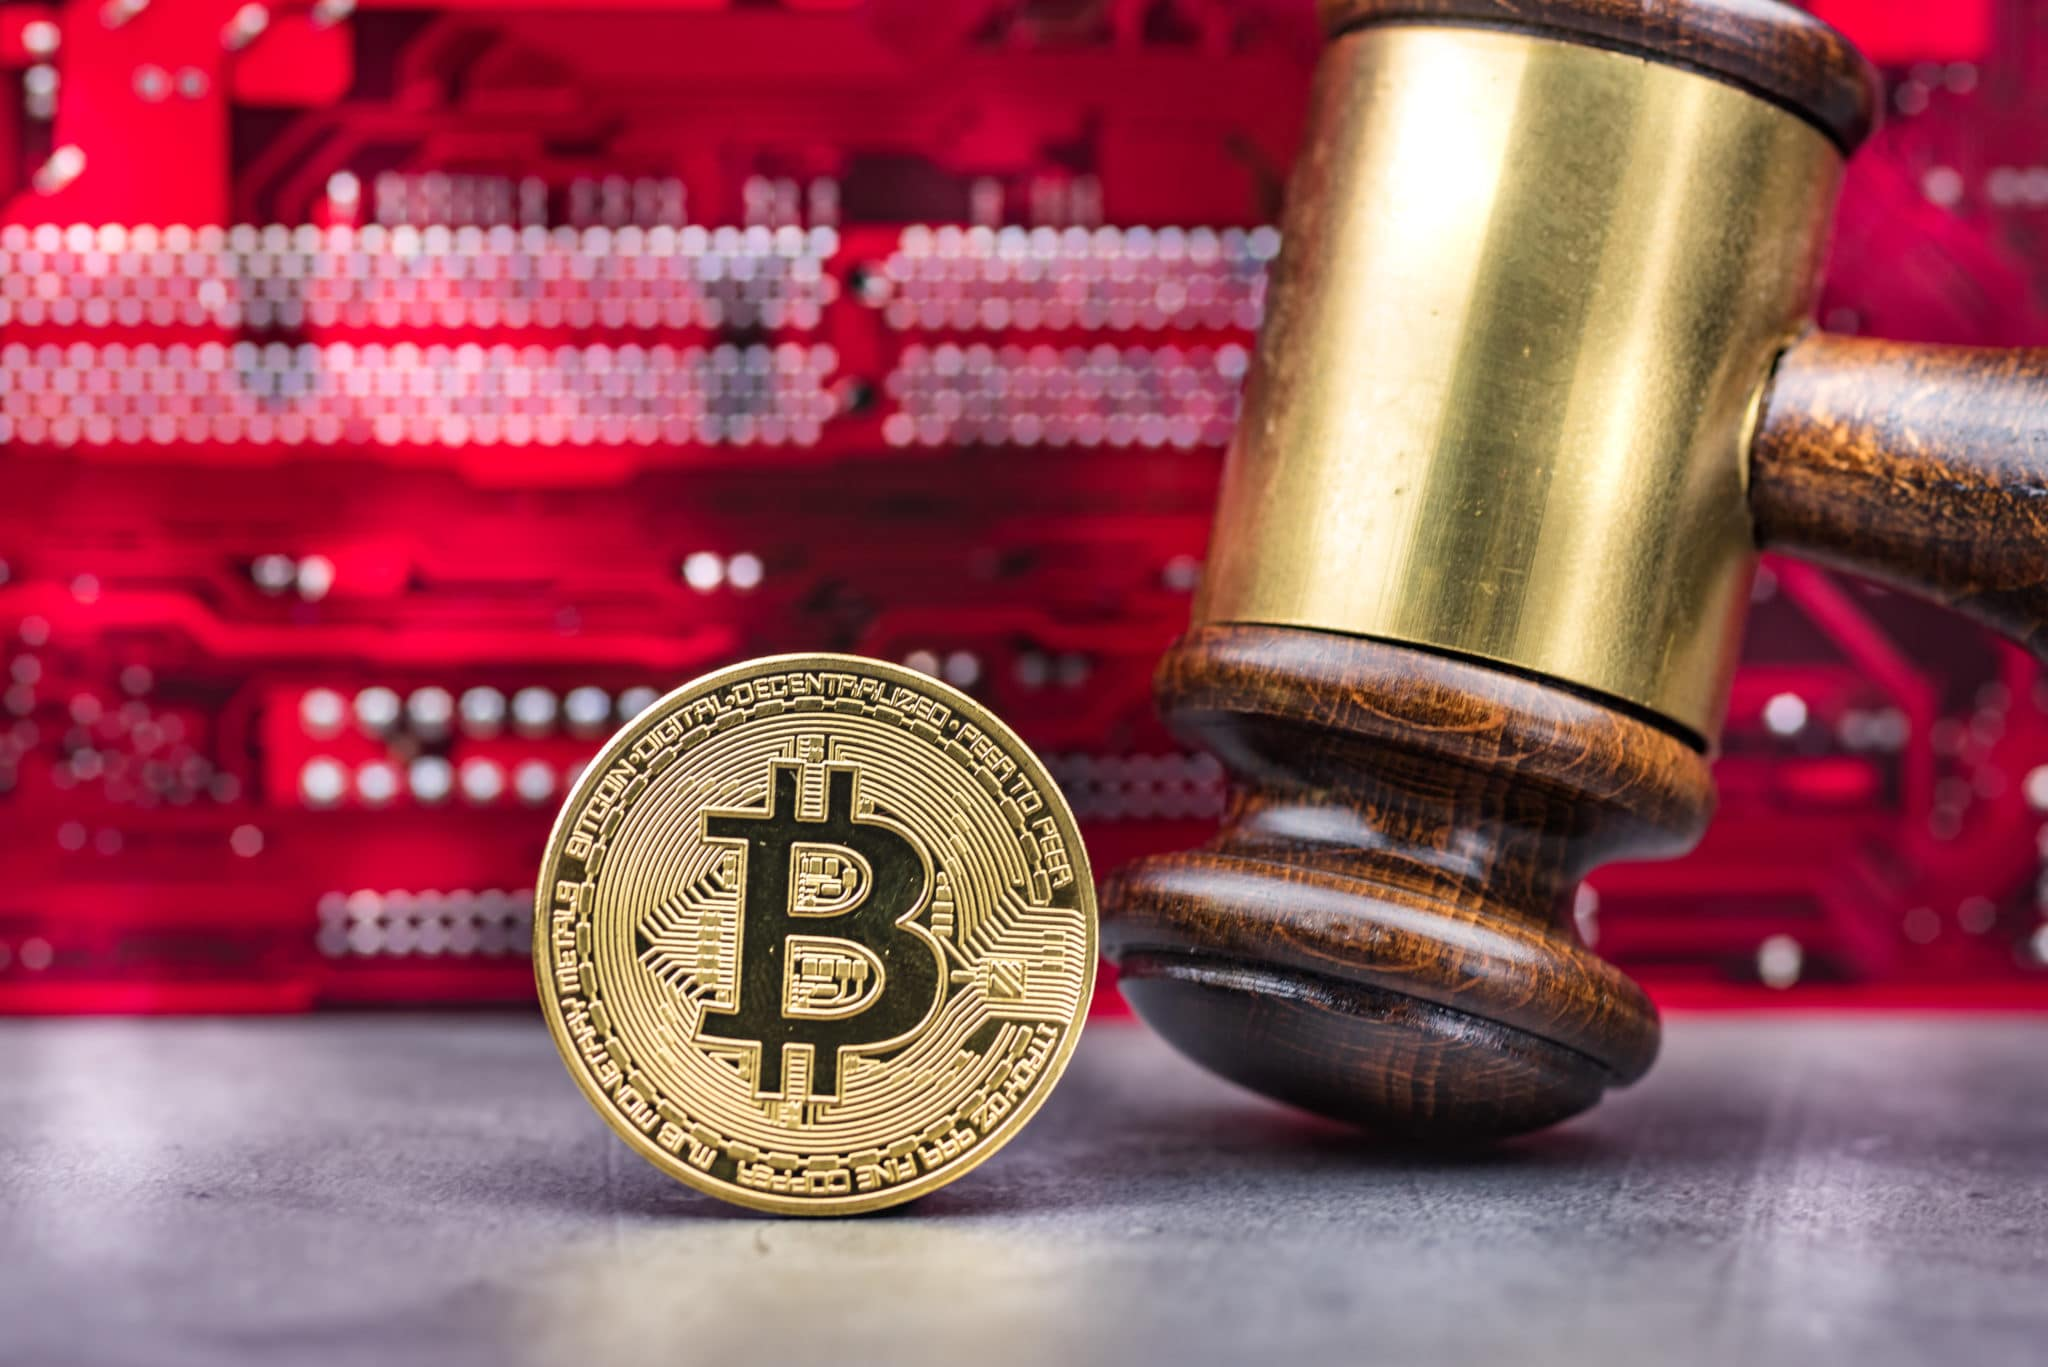 Kryptowährungen konfiszieren